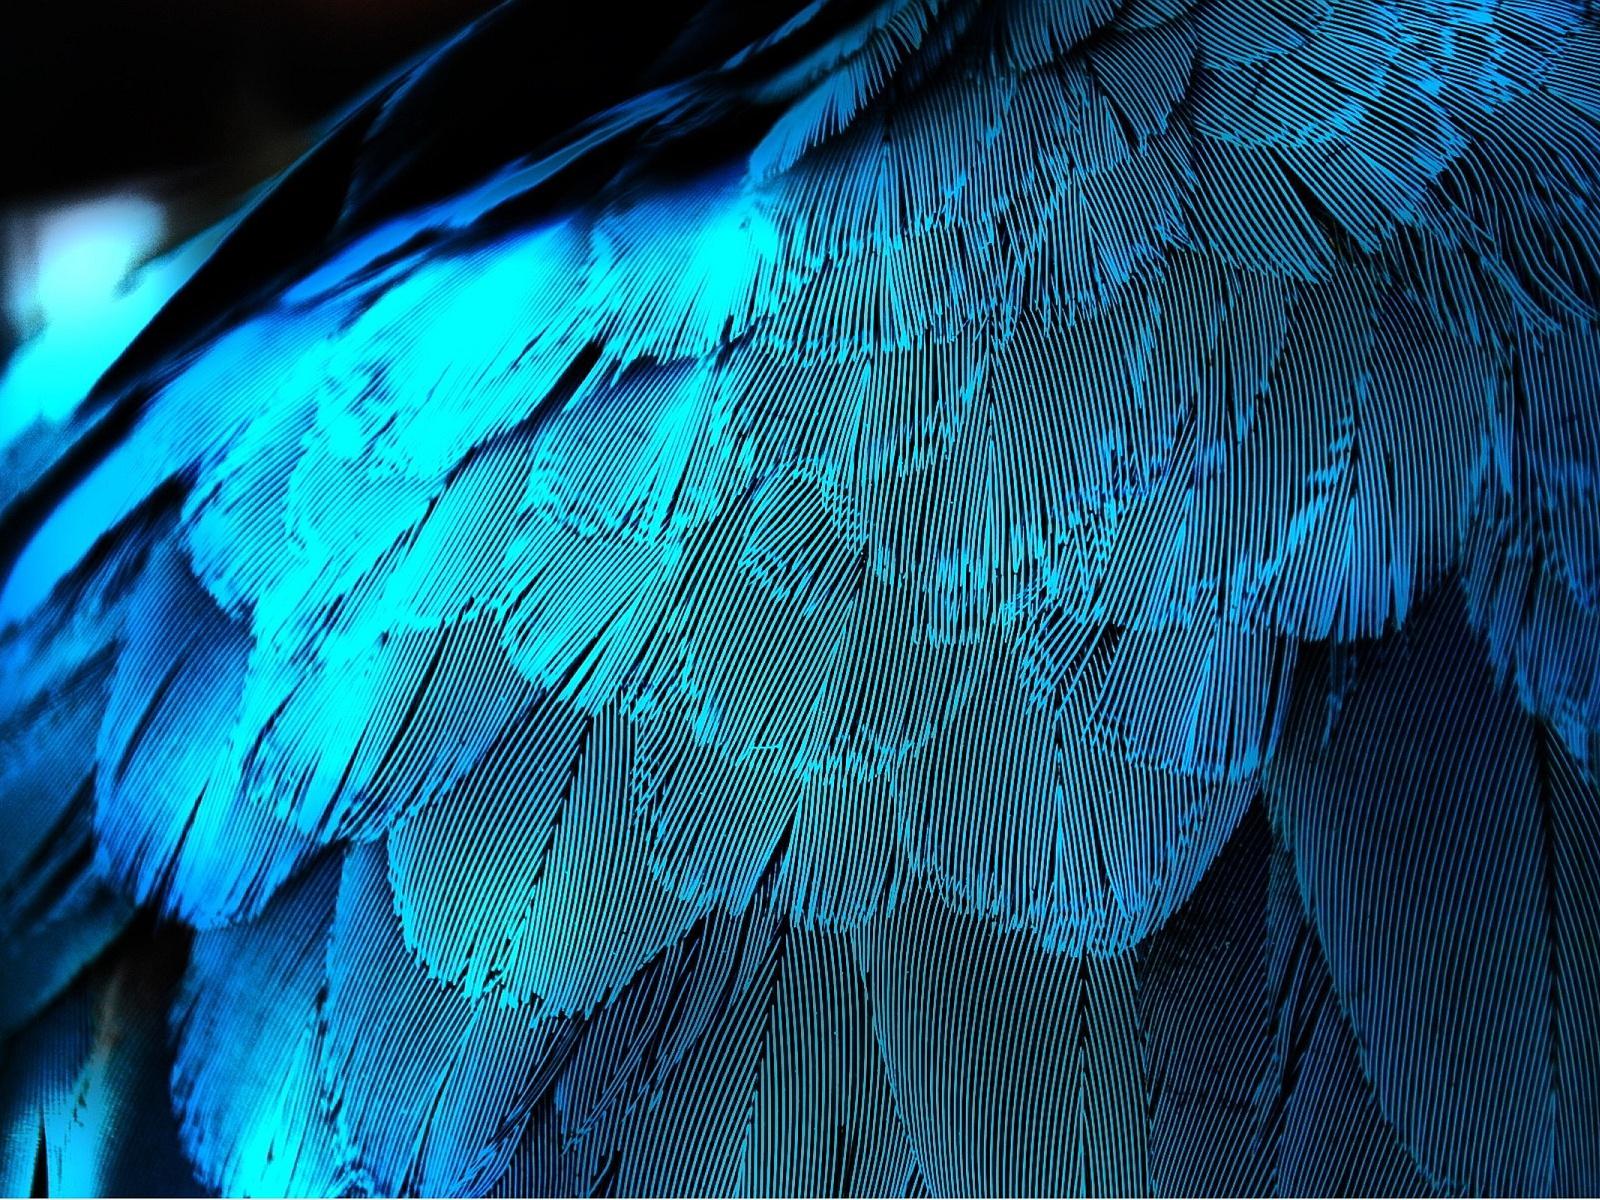 Feather Wallpaper; Feather Wallpaper; Feather Wallpaper ...